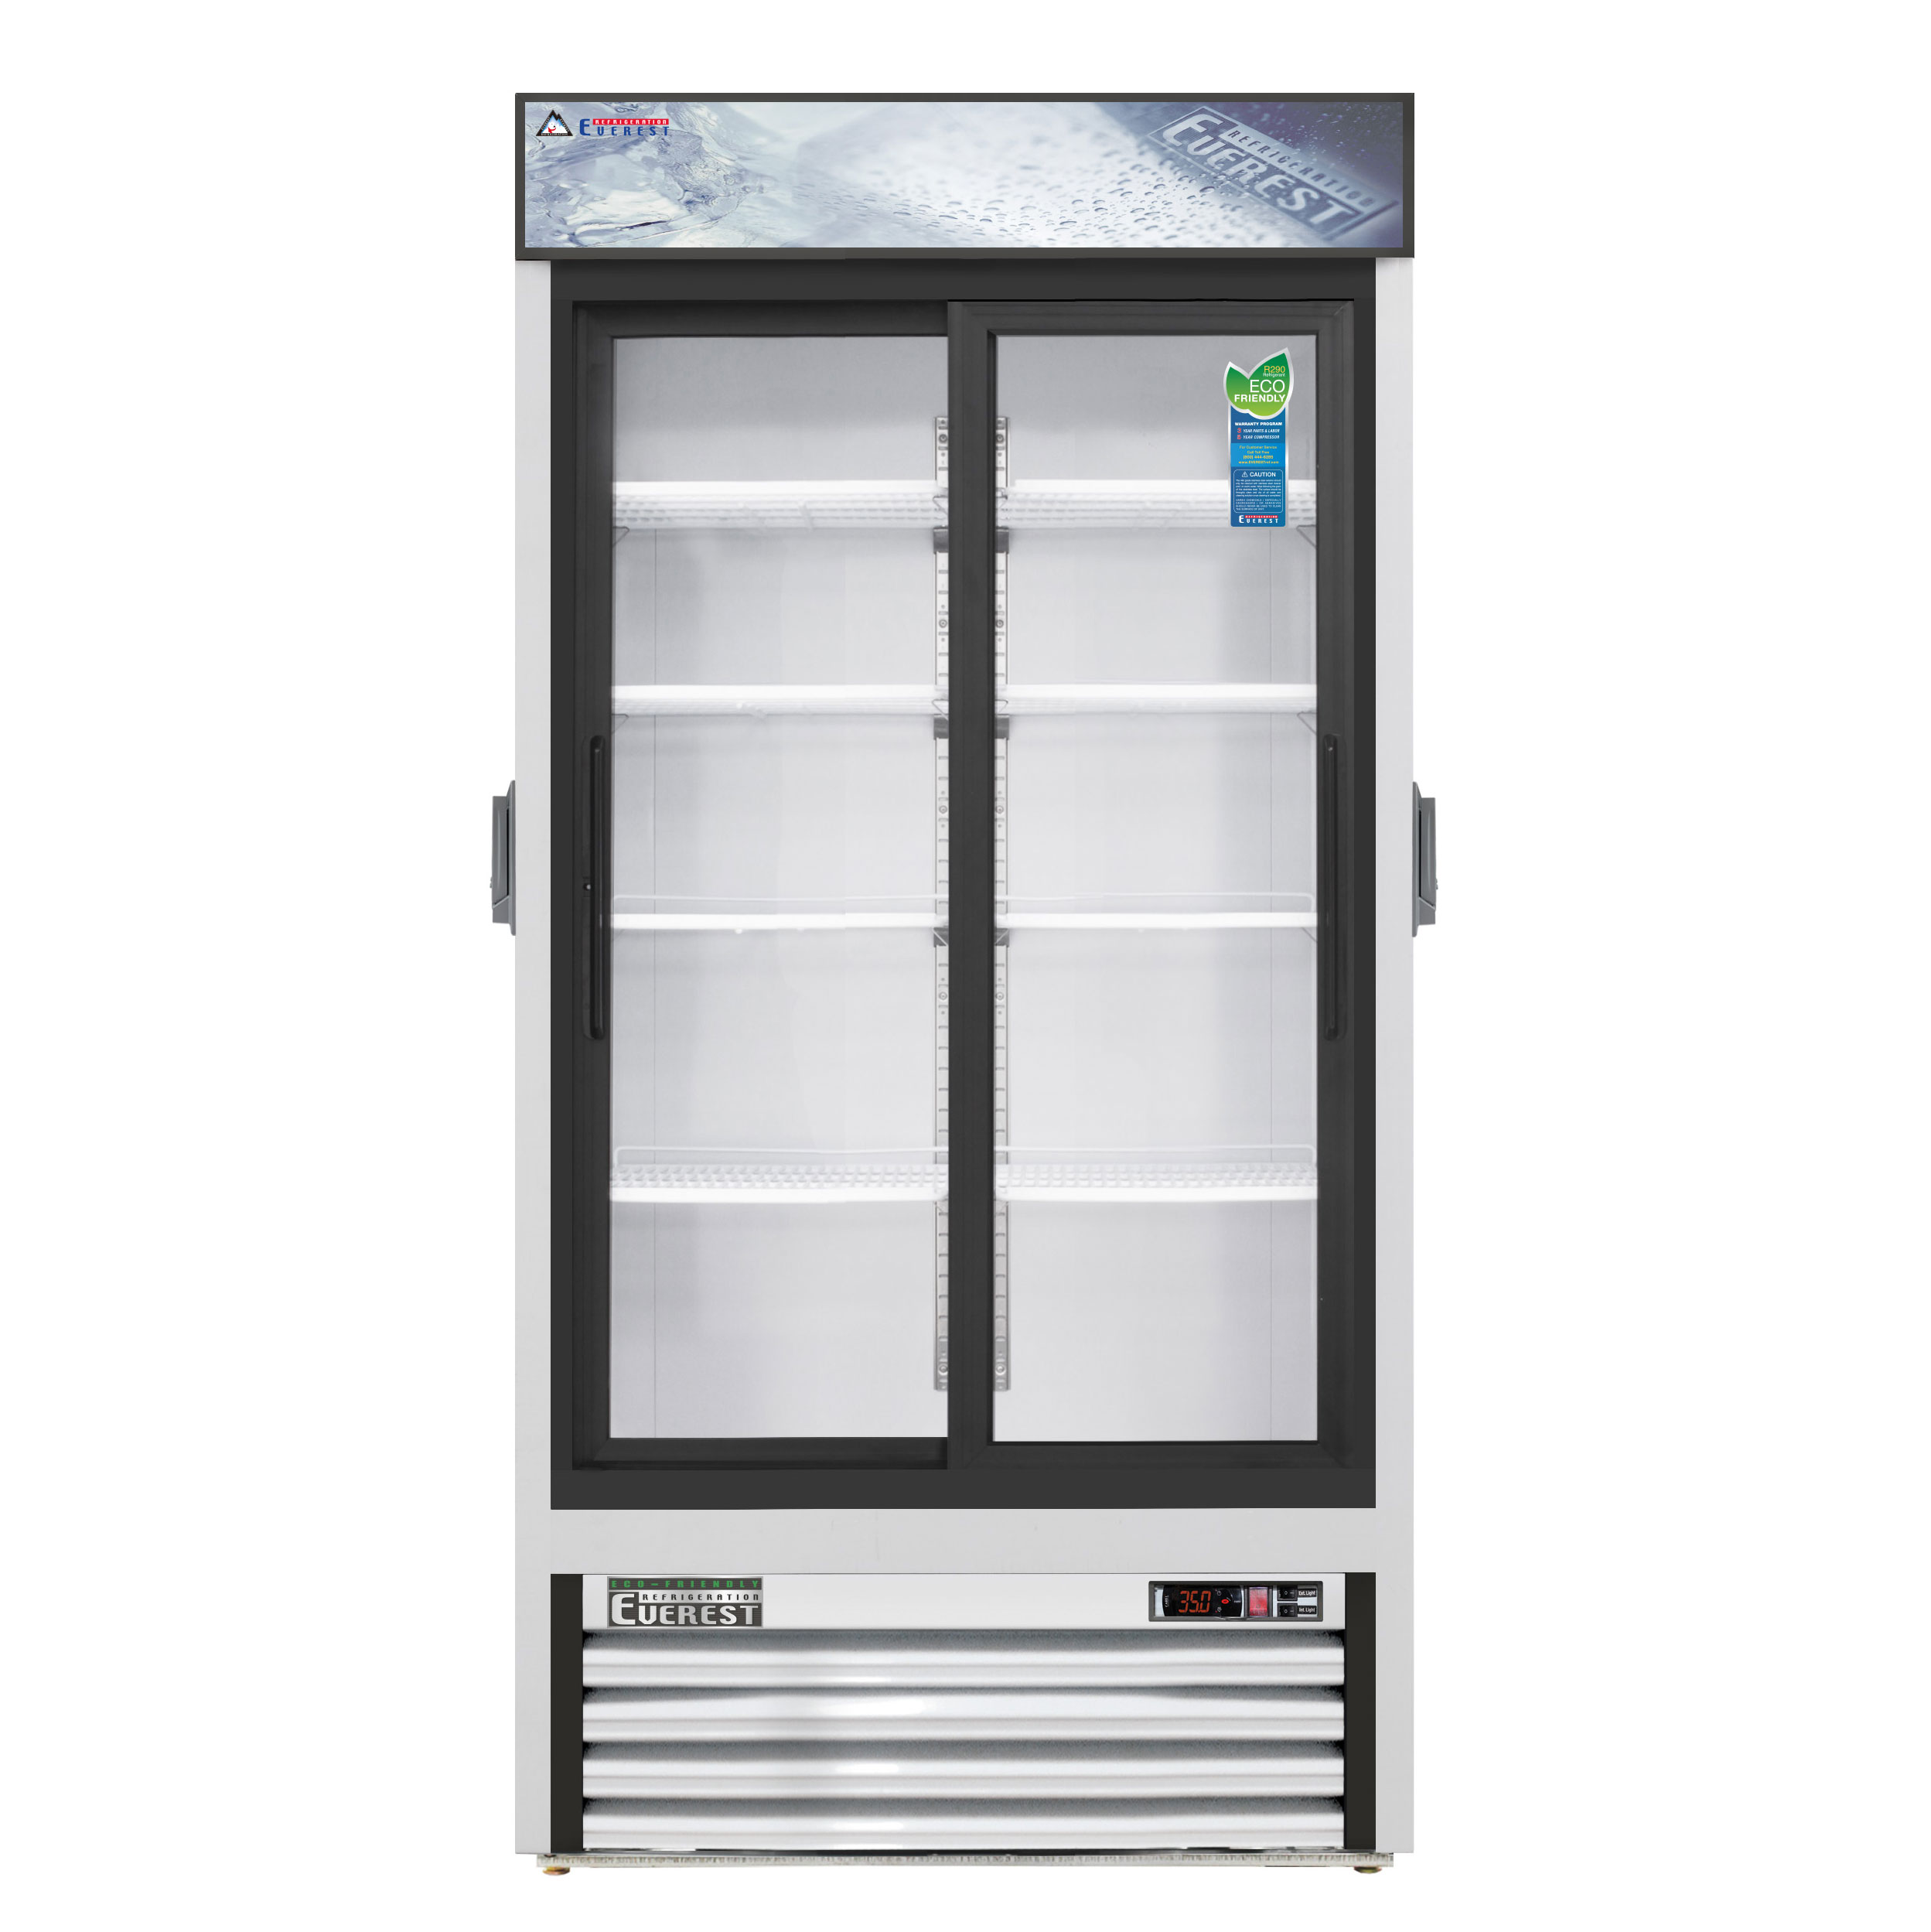 Everest Refrigeration EMGR33C refrigerator, merchandiser